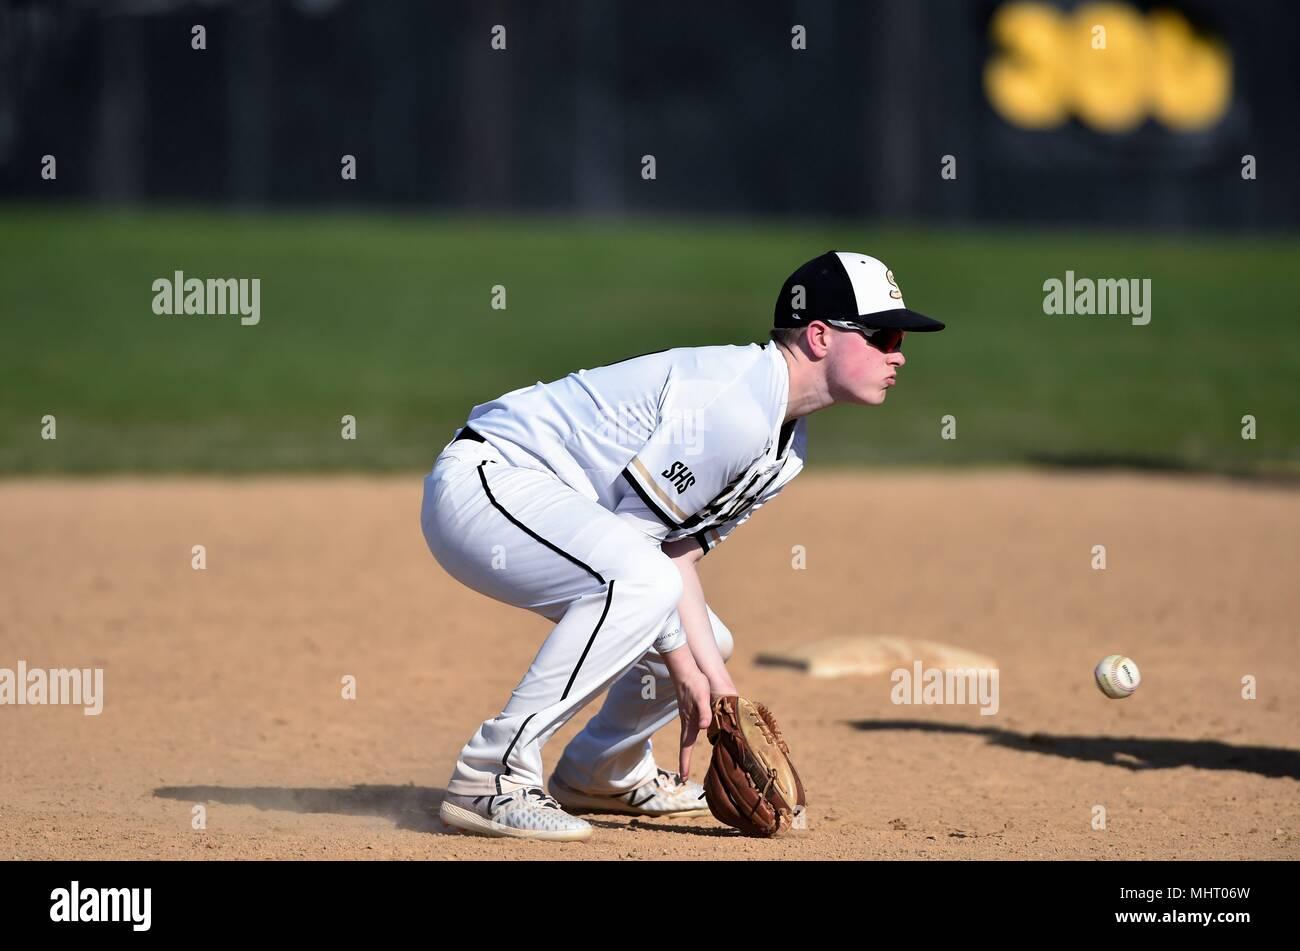 Fielding Ball Stock Photos & Fielding Ball Stock Images - Alamy